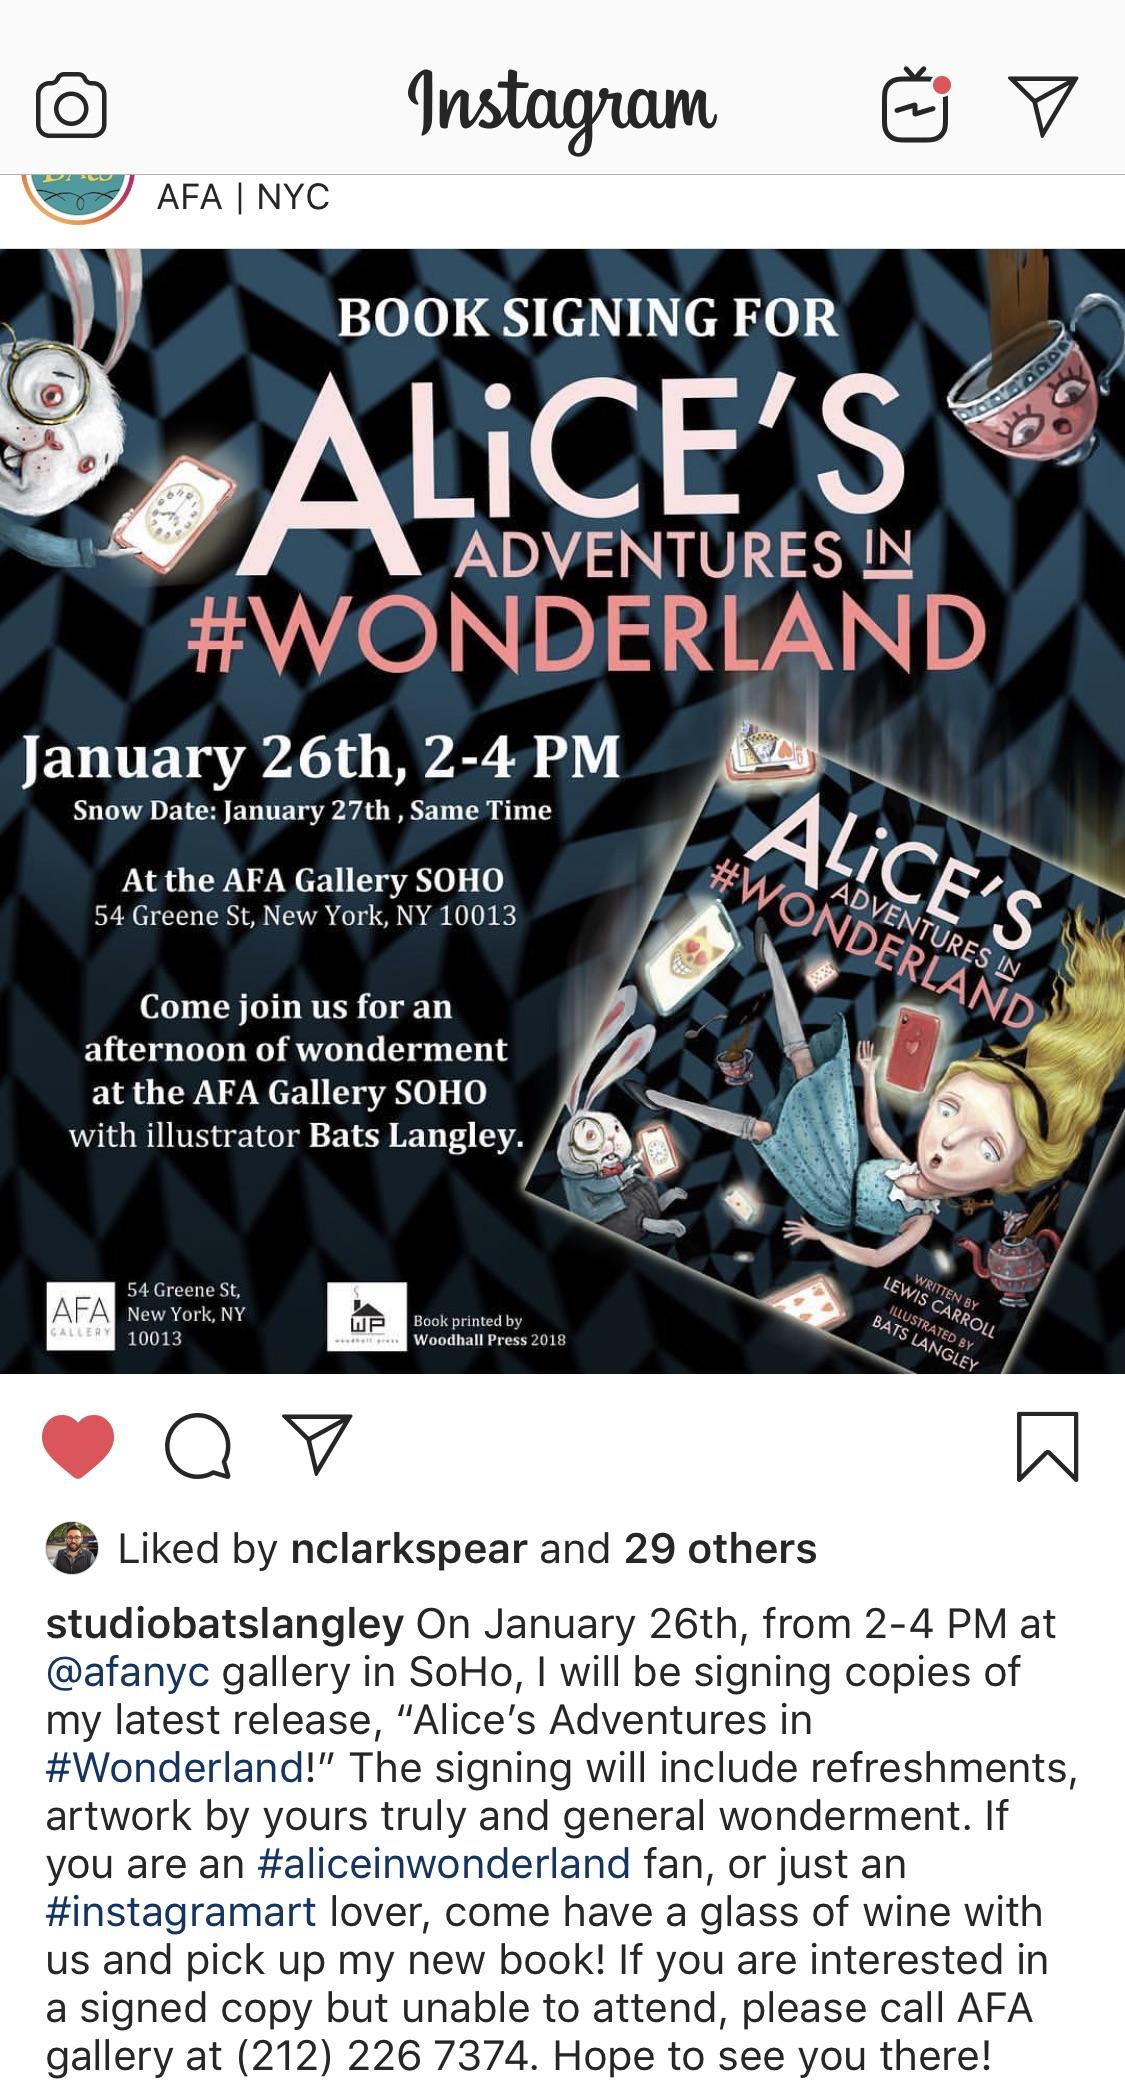 Book Signing for Alice's Adventures In #Wonderland - Mind KEY